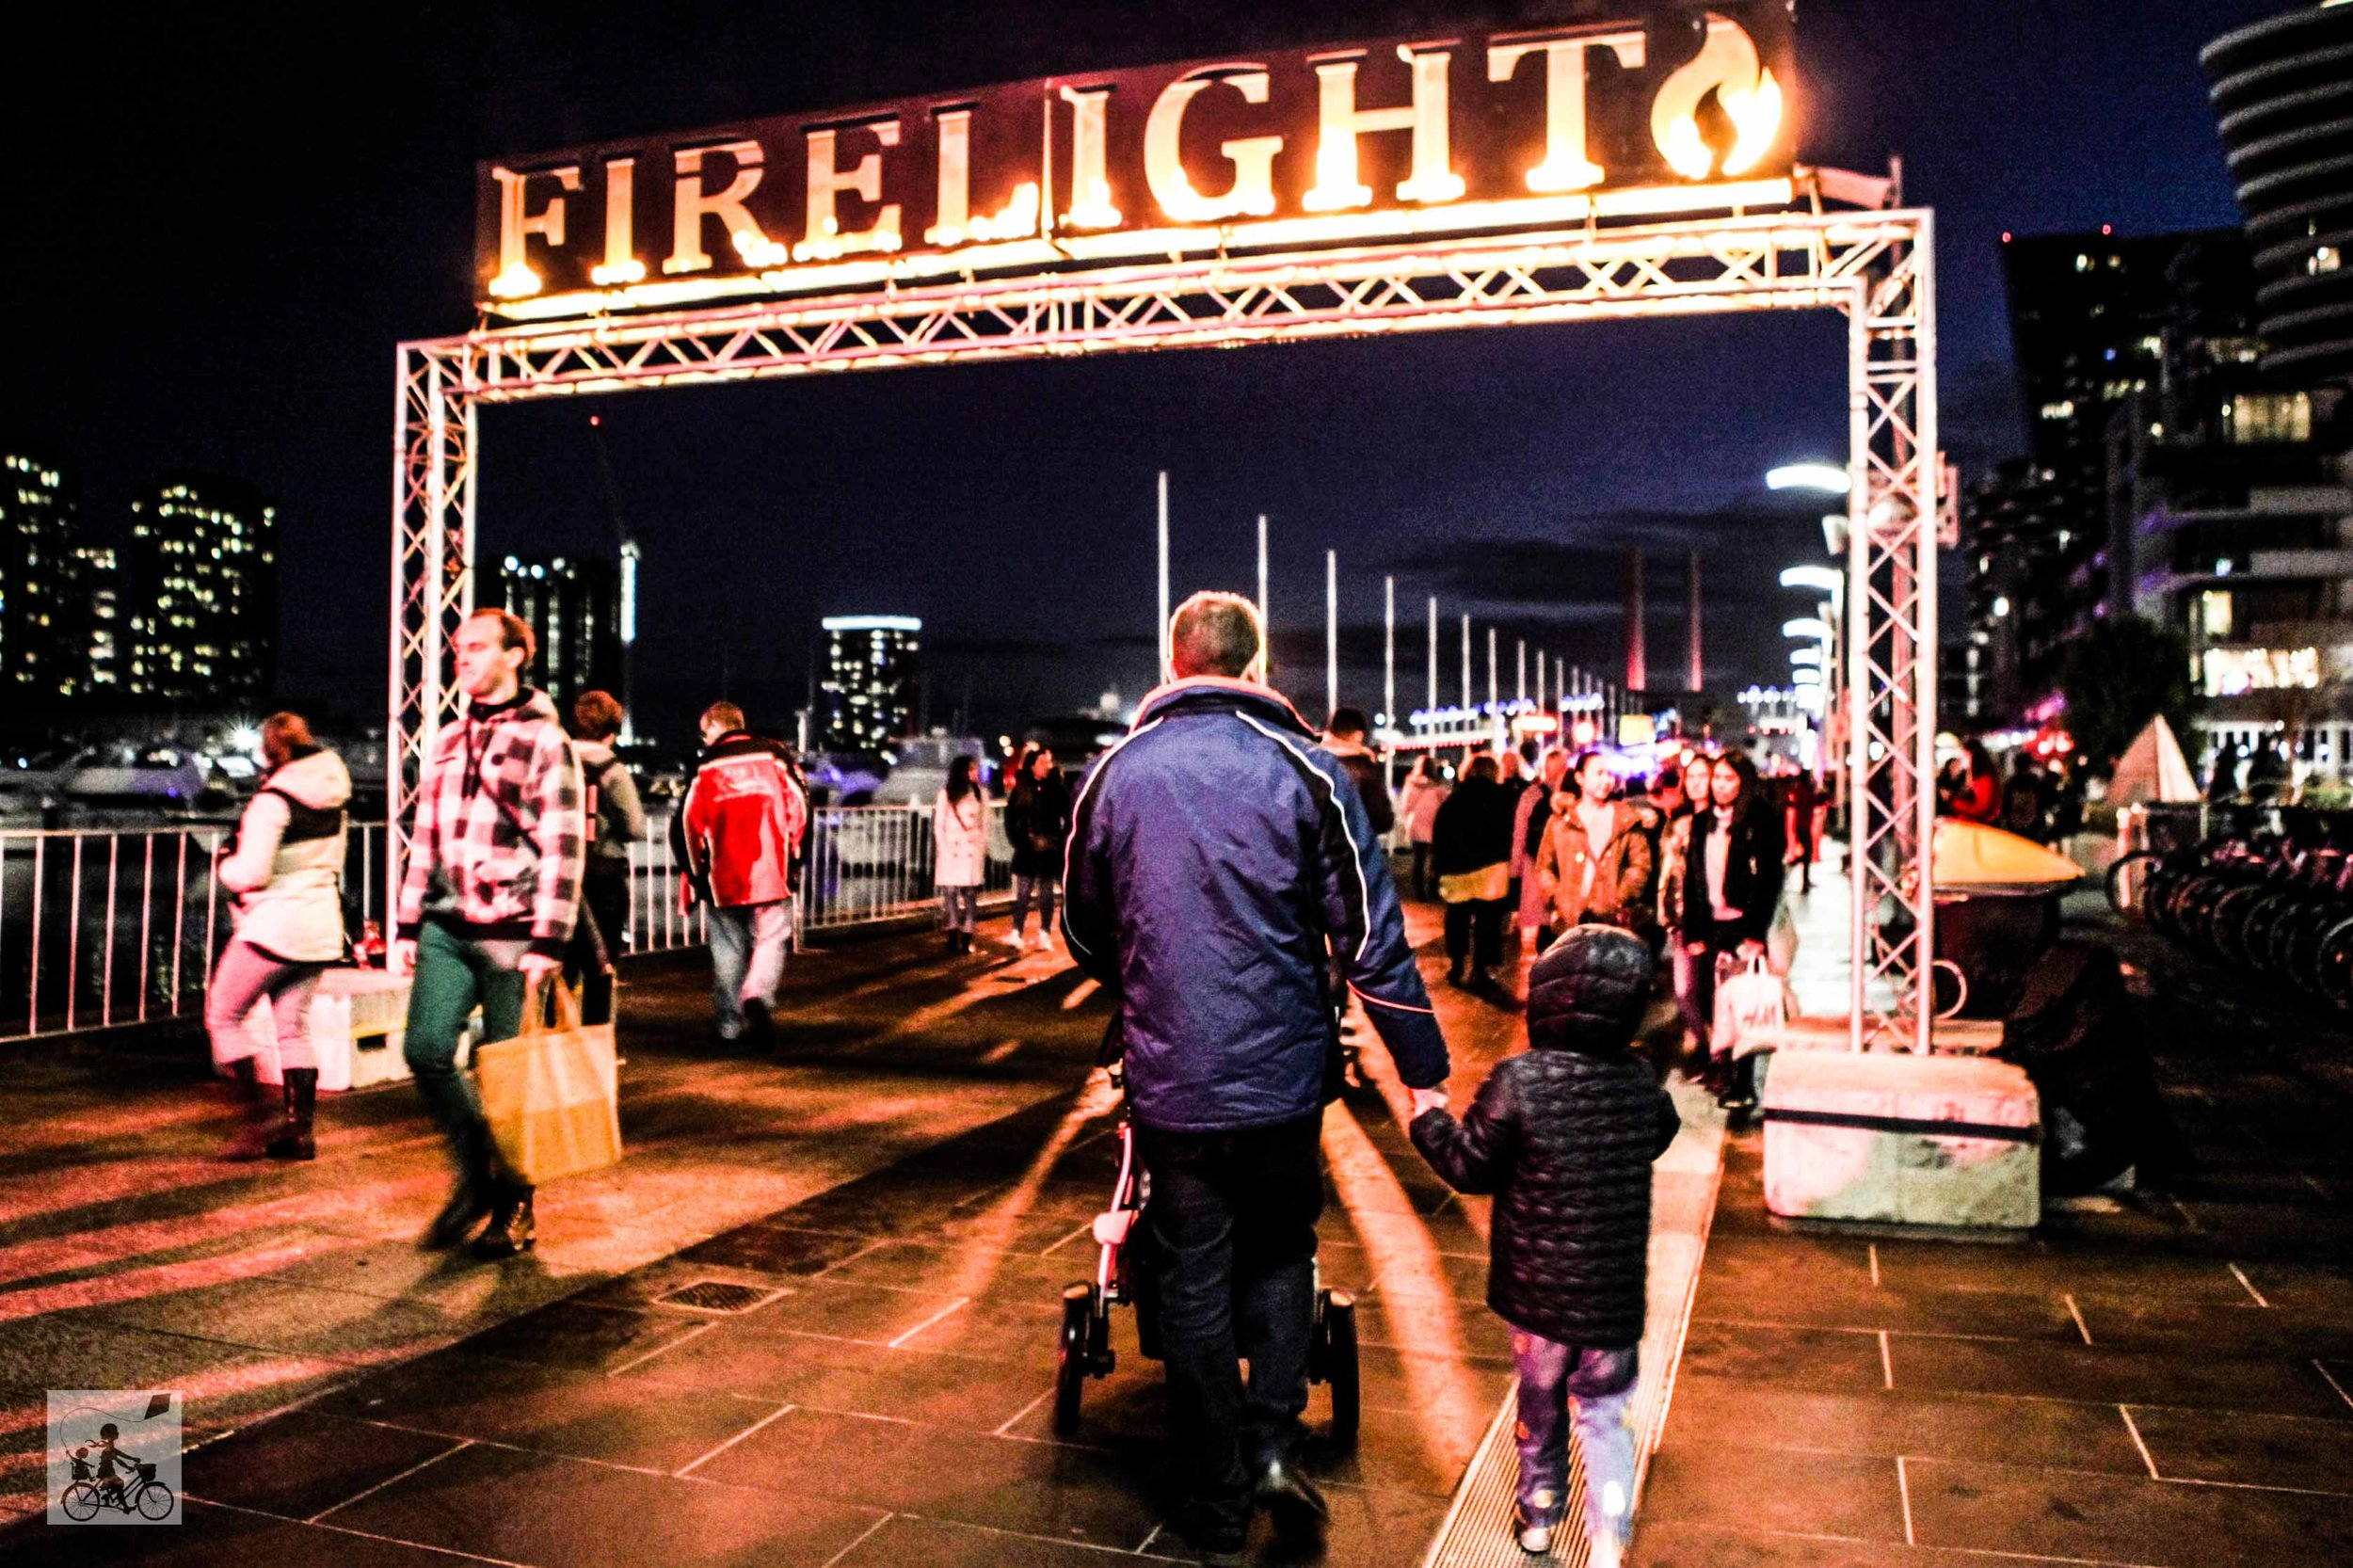 Firelight Festival @ Docklands